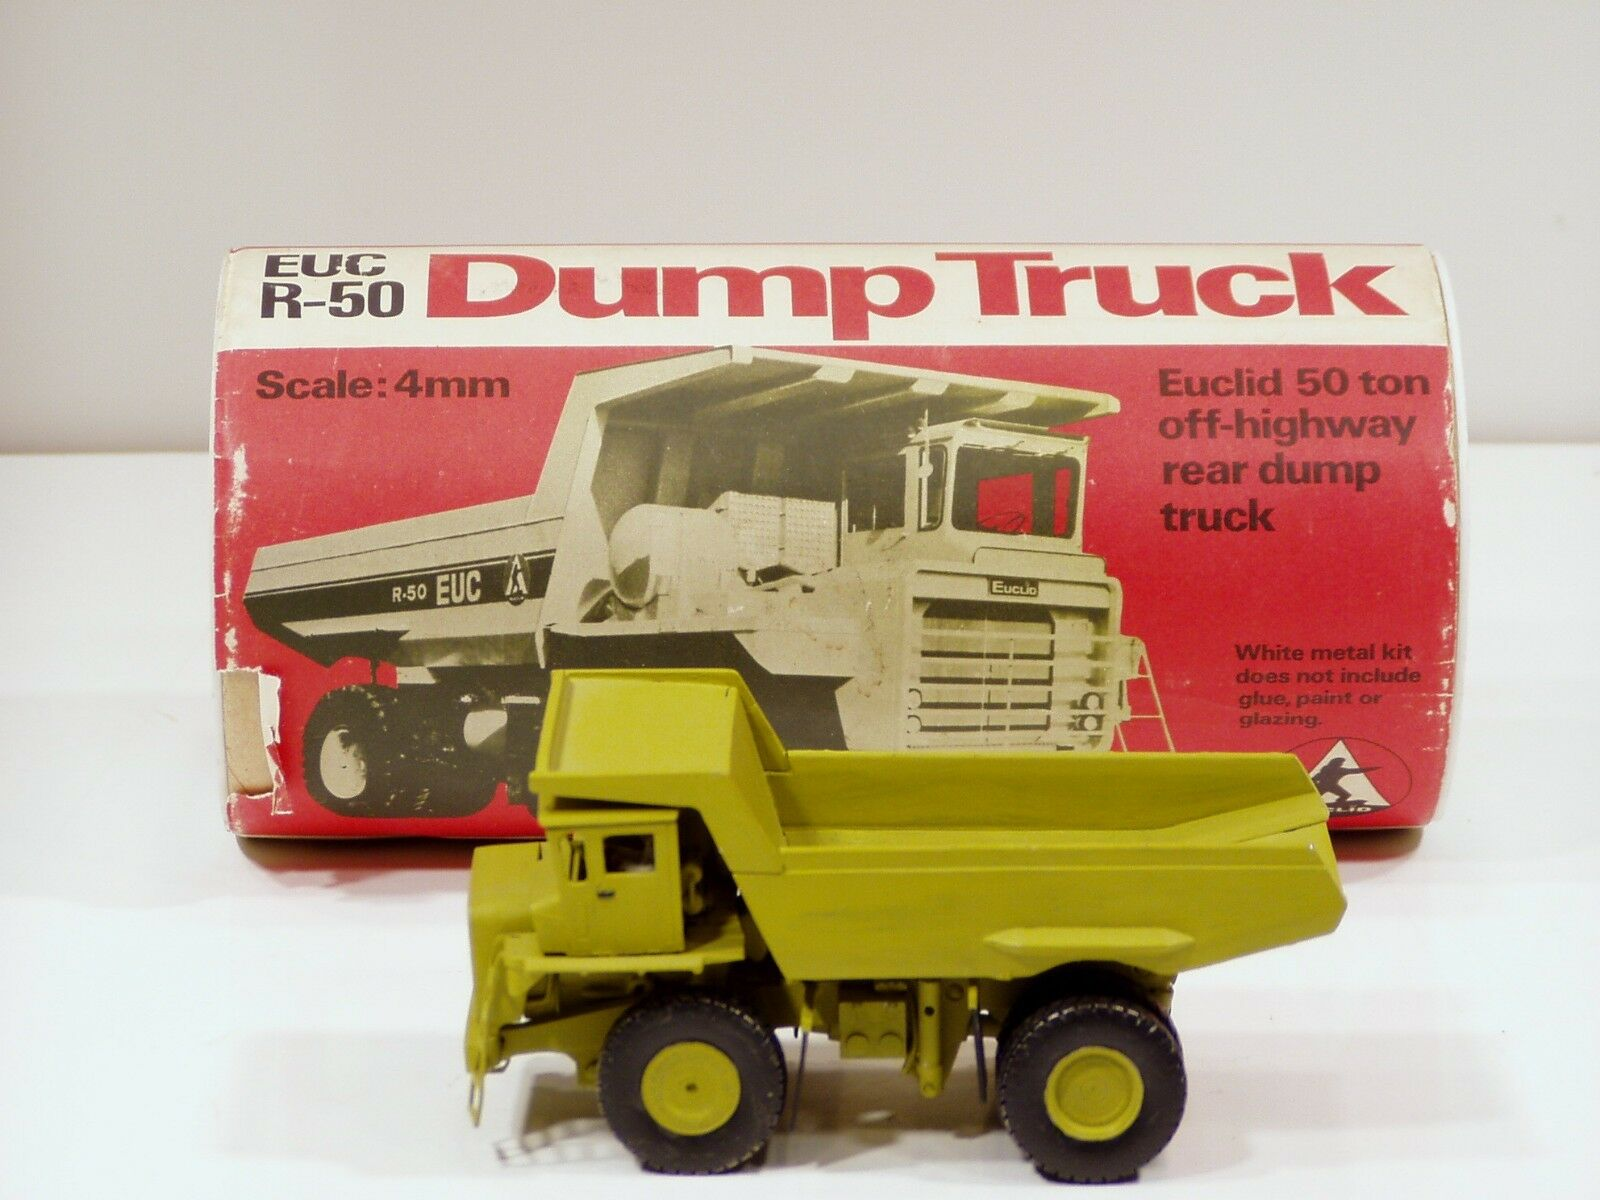 Euclid R50 Dump Truck - 1 50 - P.D.Jones - Built Metal Kit